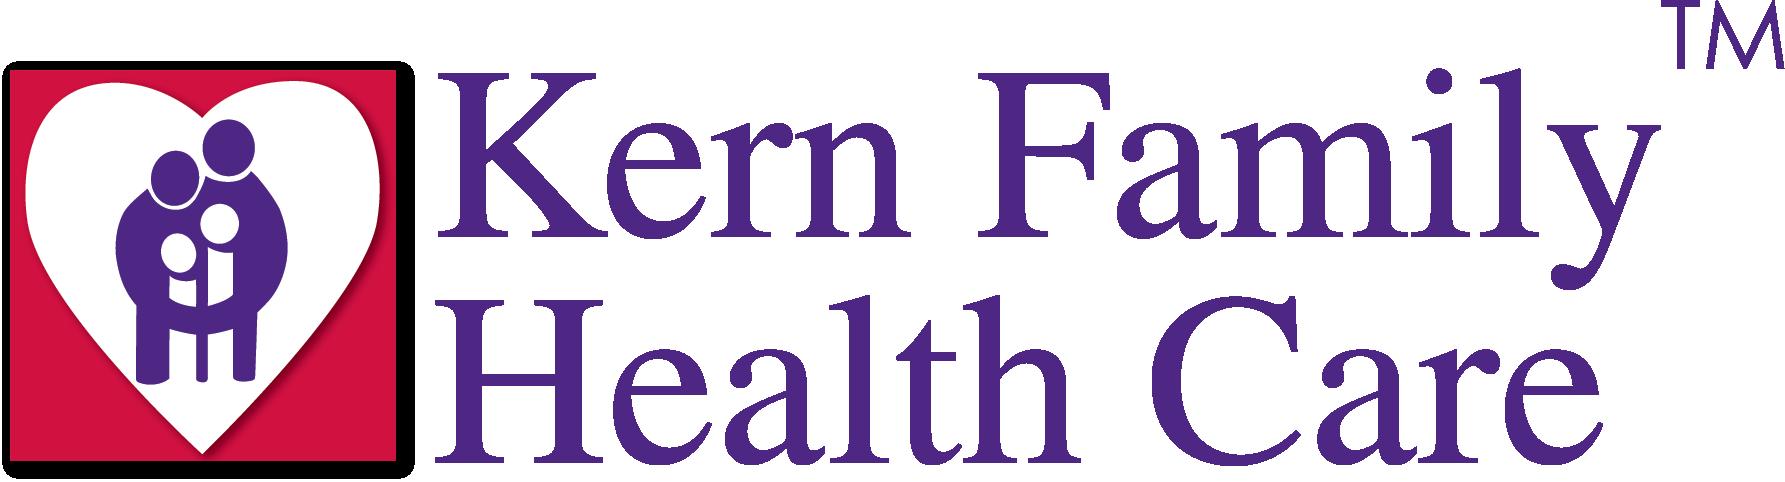 Kern Family Health Care logo